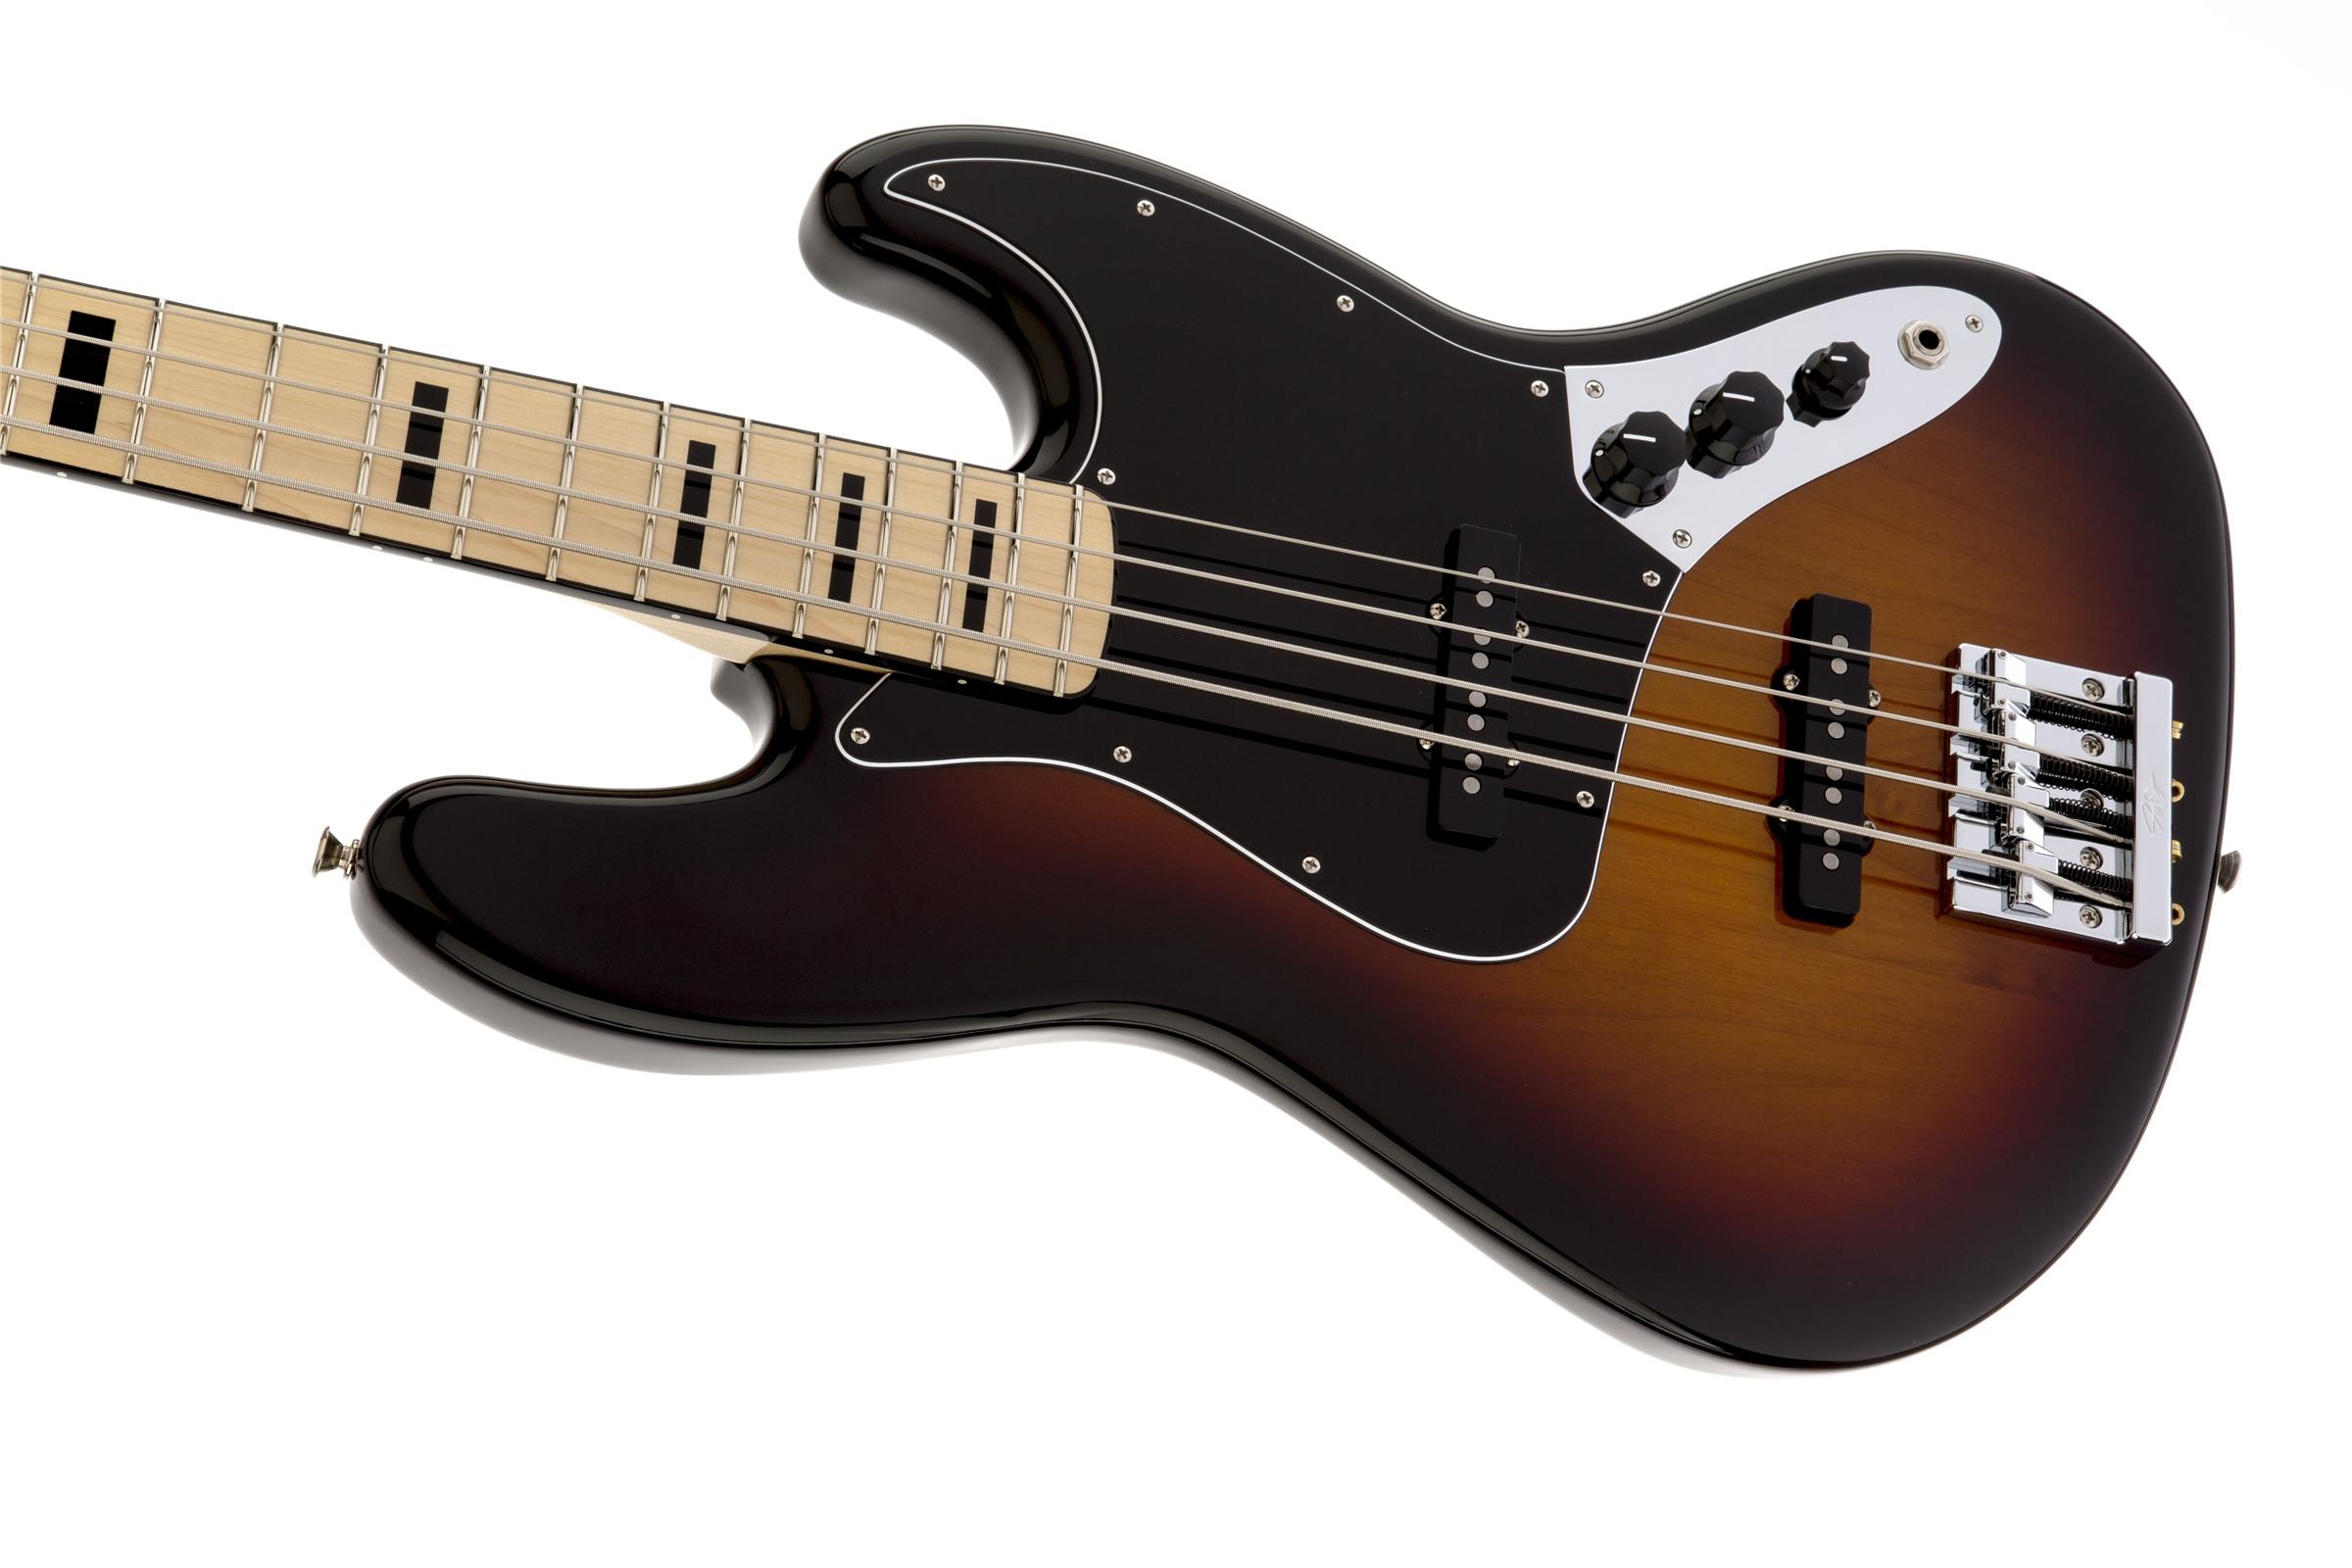 Fender Active Jazz B Wiring Diagram | Manual E-Books - Fender Jazz Bass Wiring Diagram